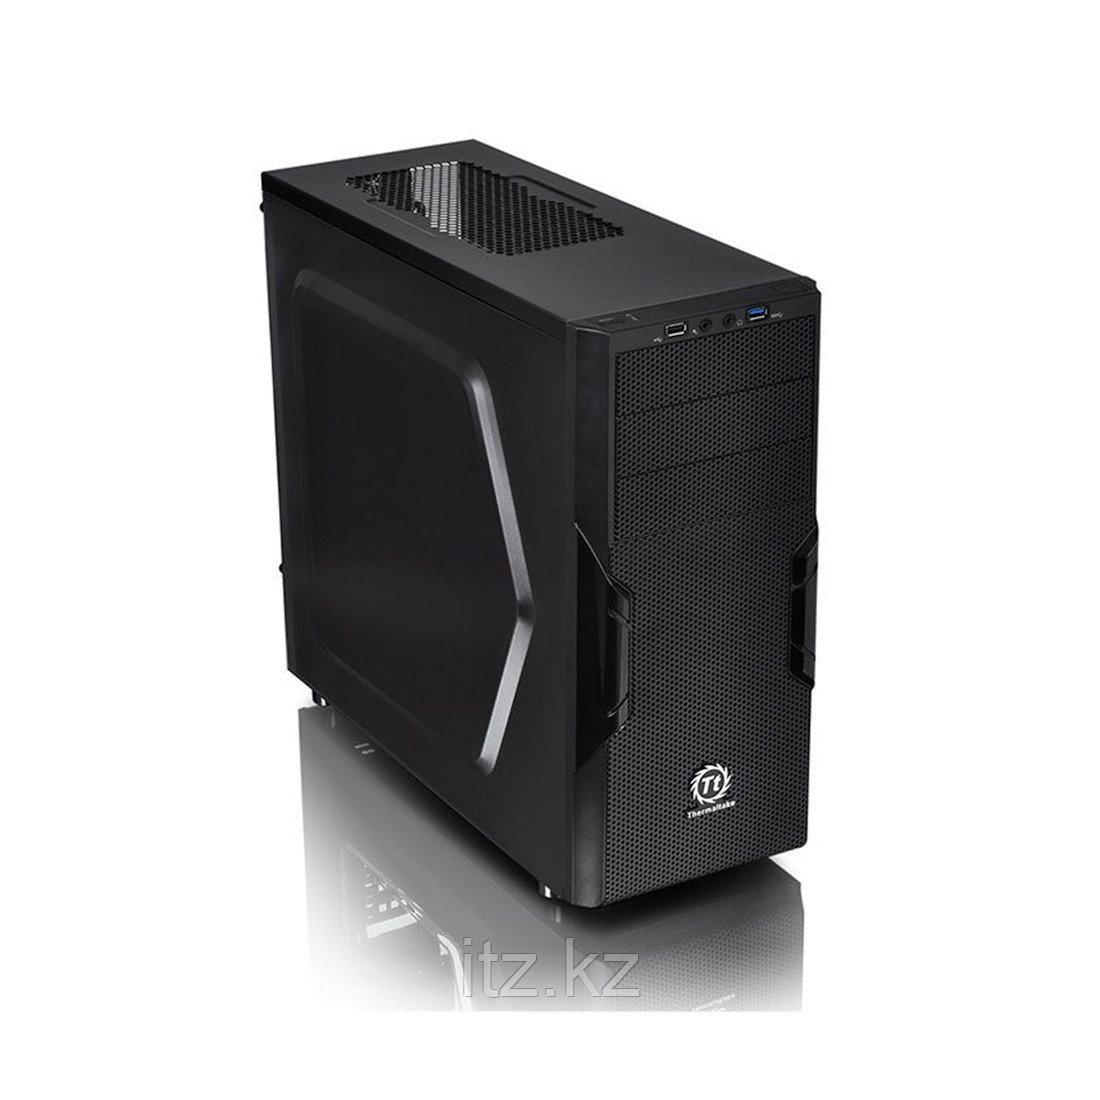 Компьютерный корпус Thermaltake Versa H22 без Б/П